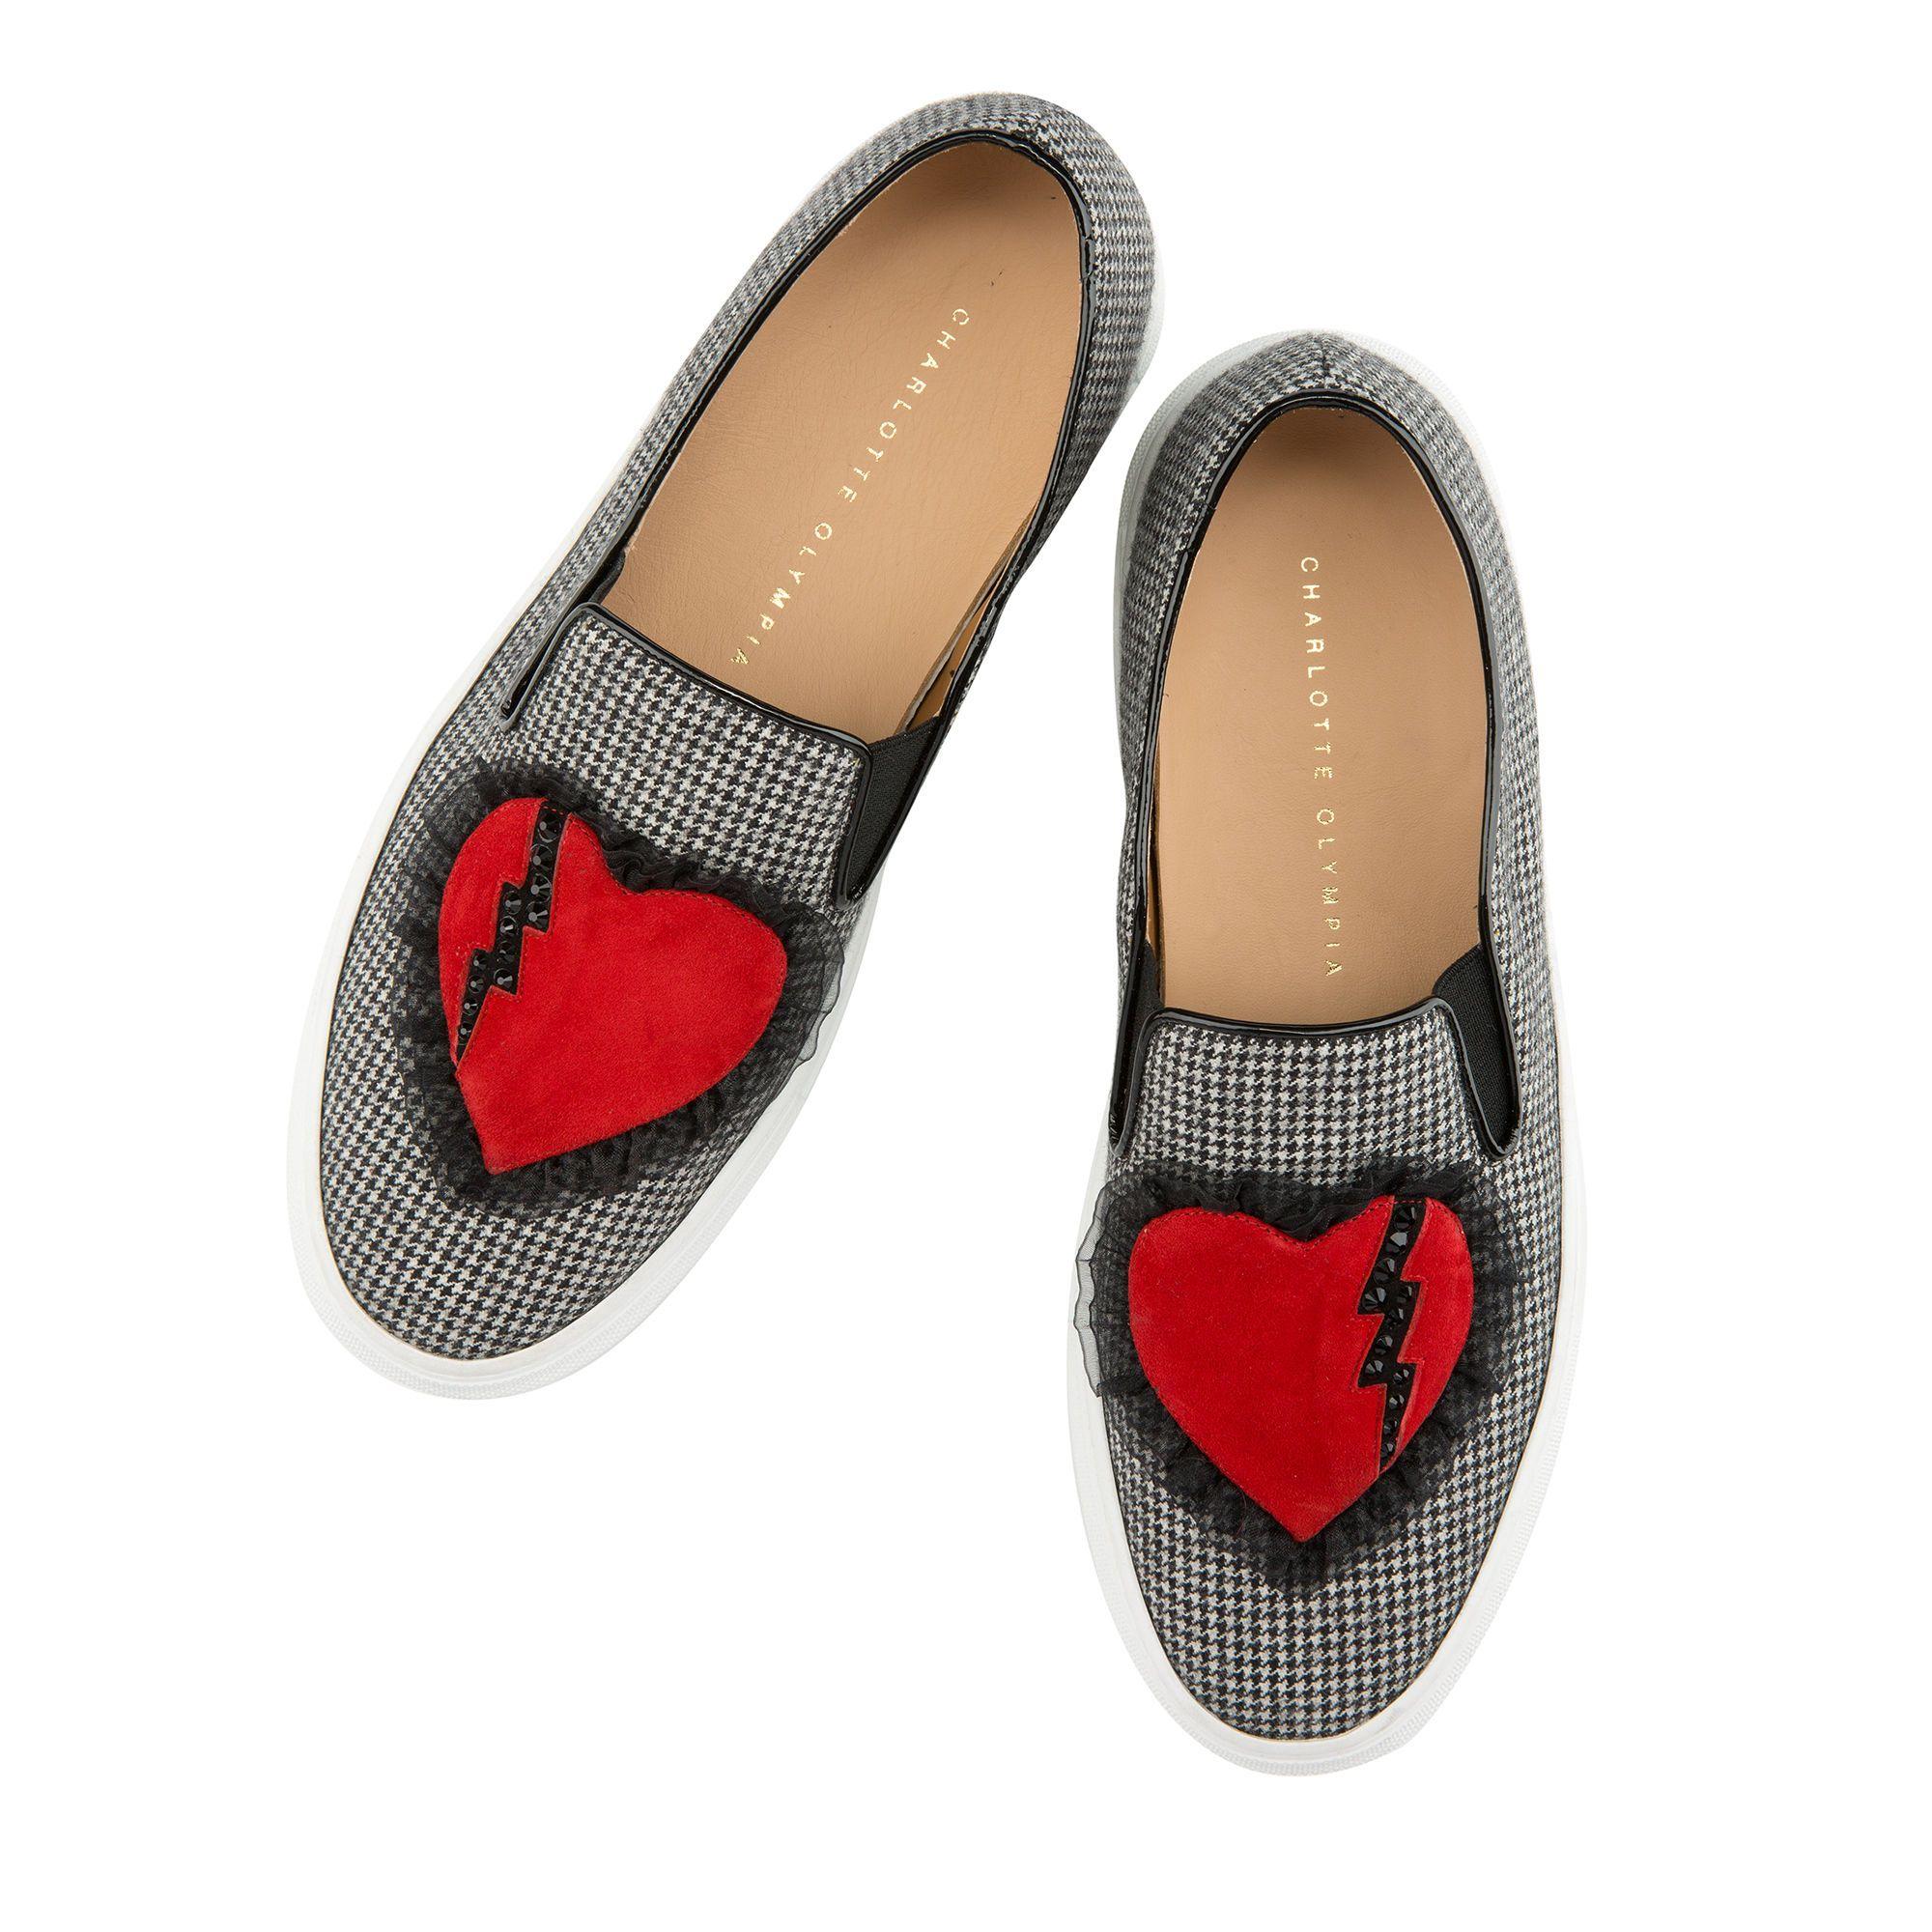 CHARLOTTE OLYMPIA BROKEN HEART ALEX. #charlotteolympia #shoes #